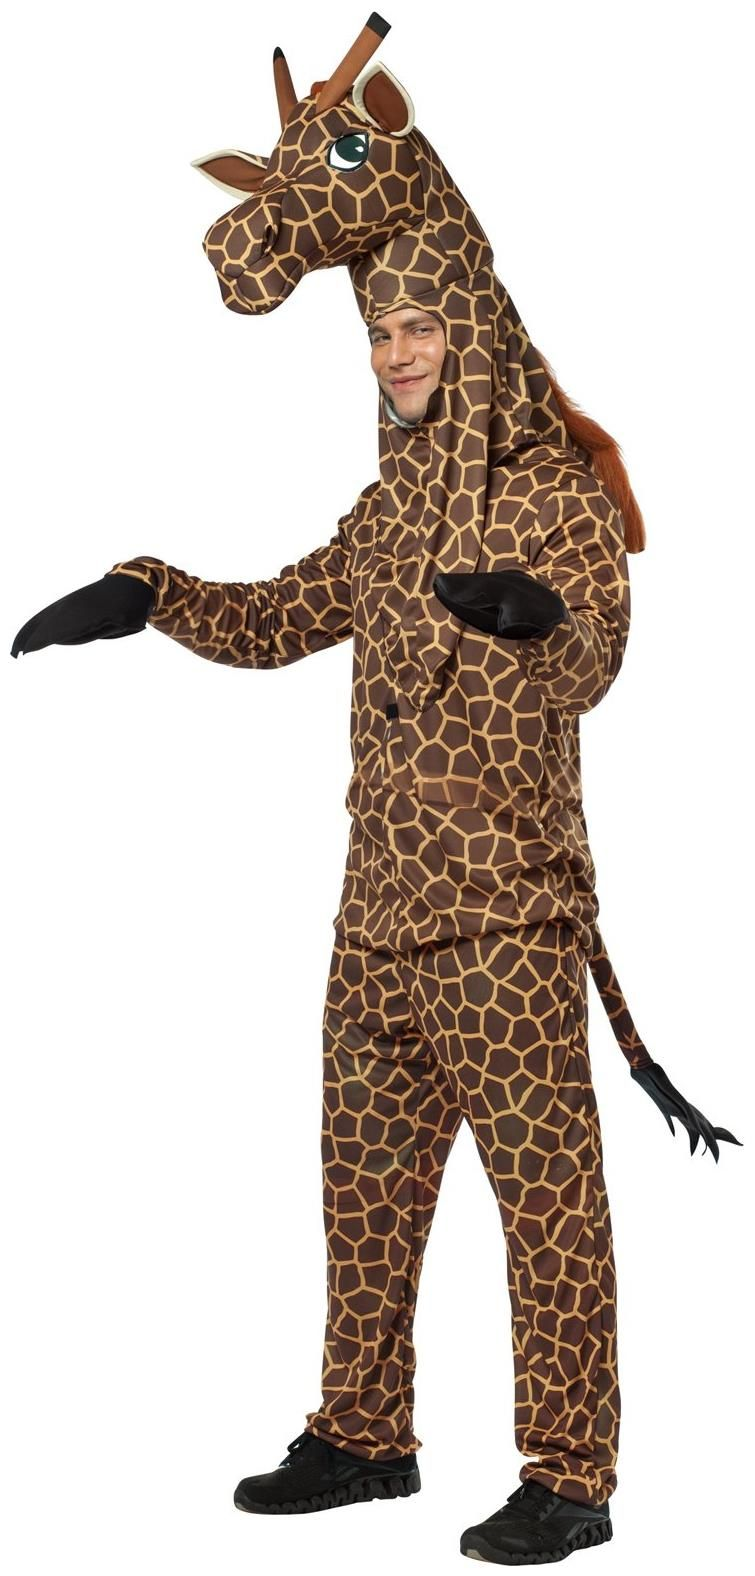 Giraffe Adult Costume #halloween #costumes #halloweencostume #mencostume #adultcostume